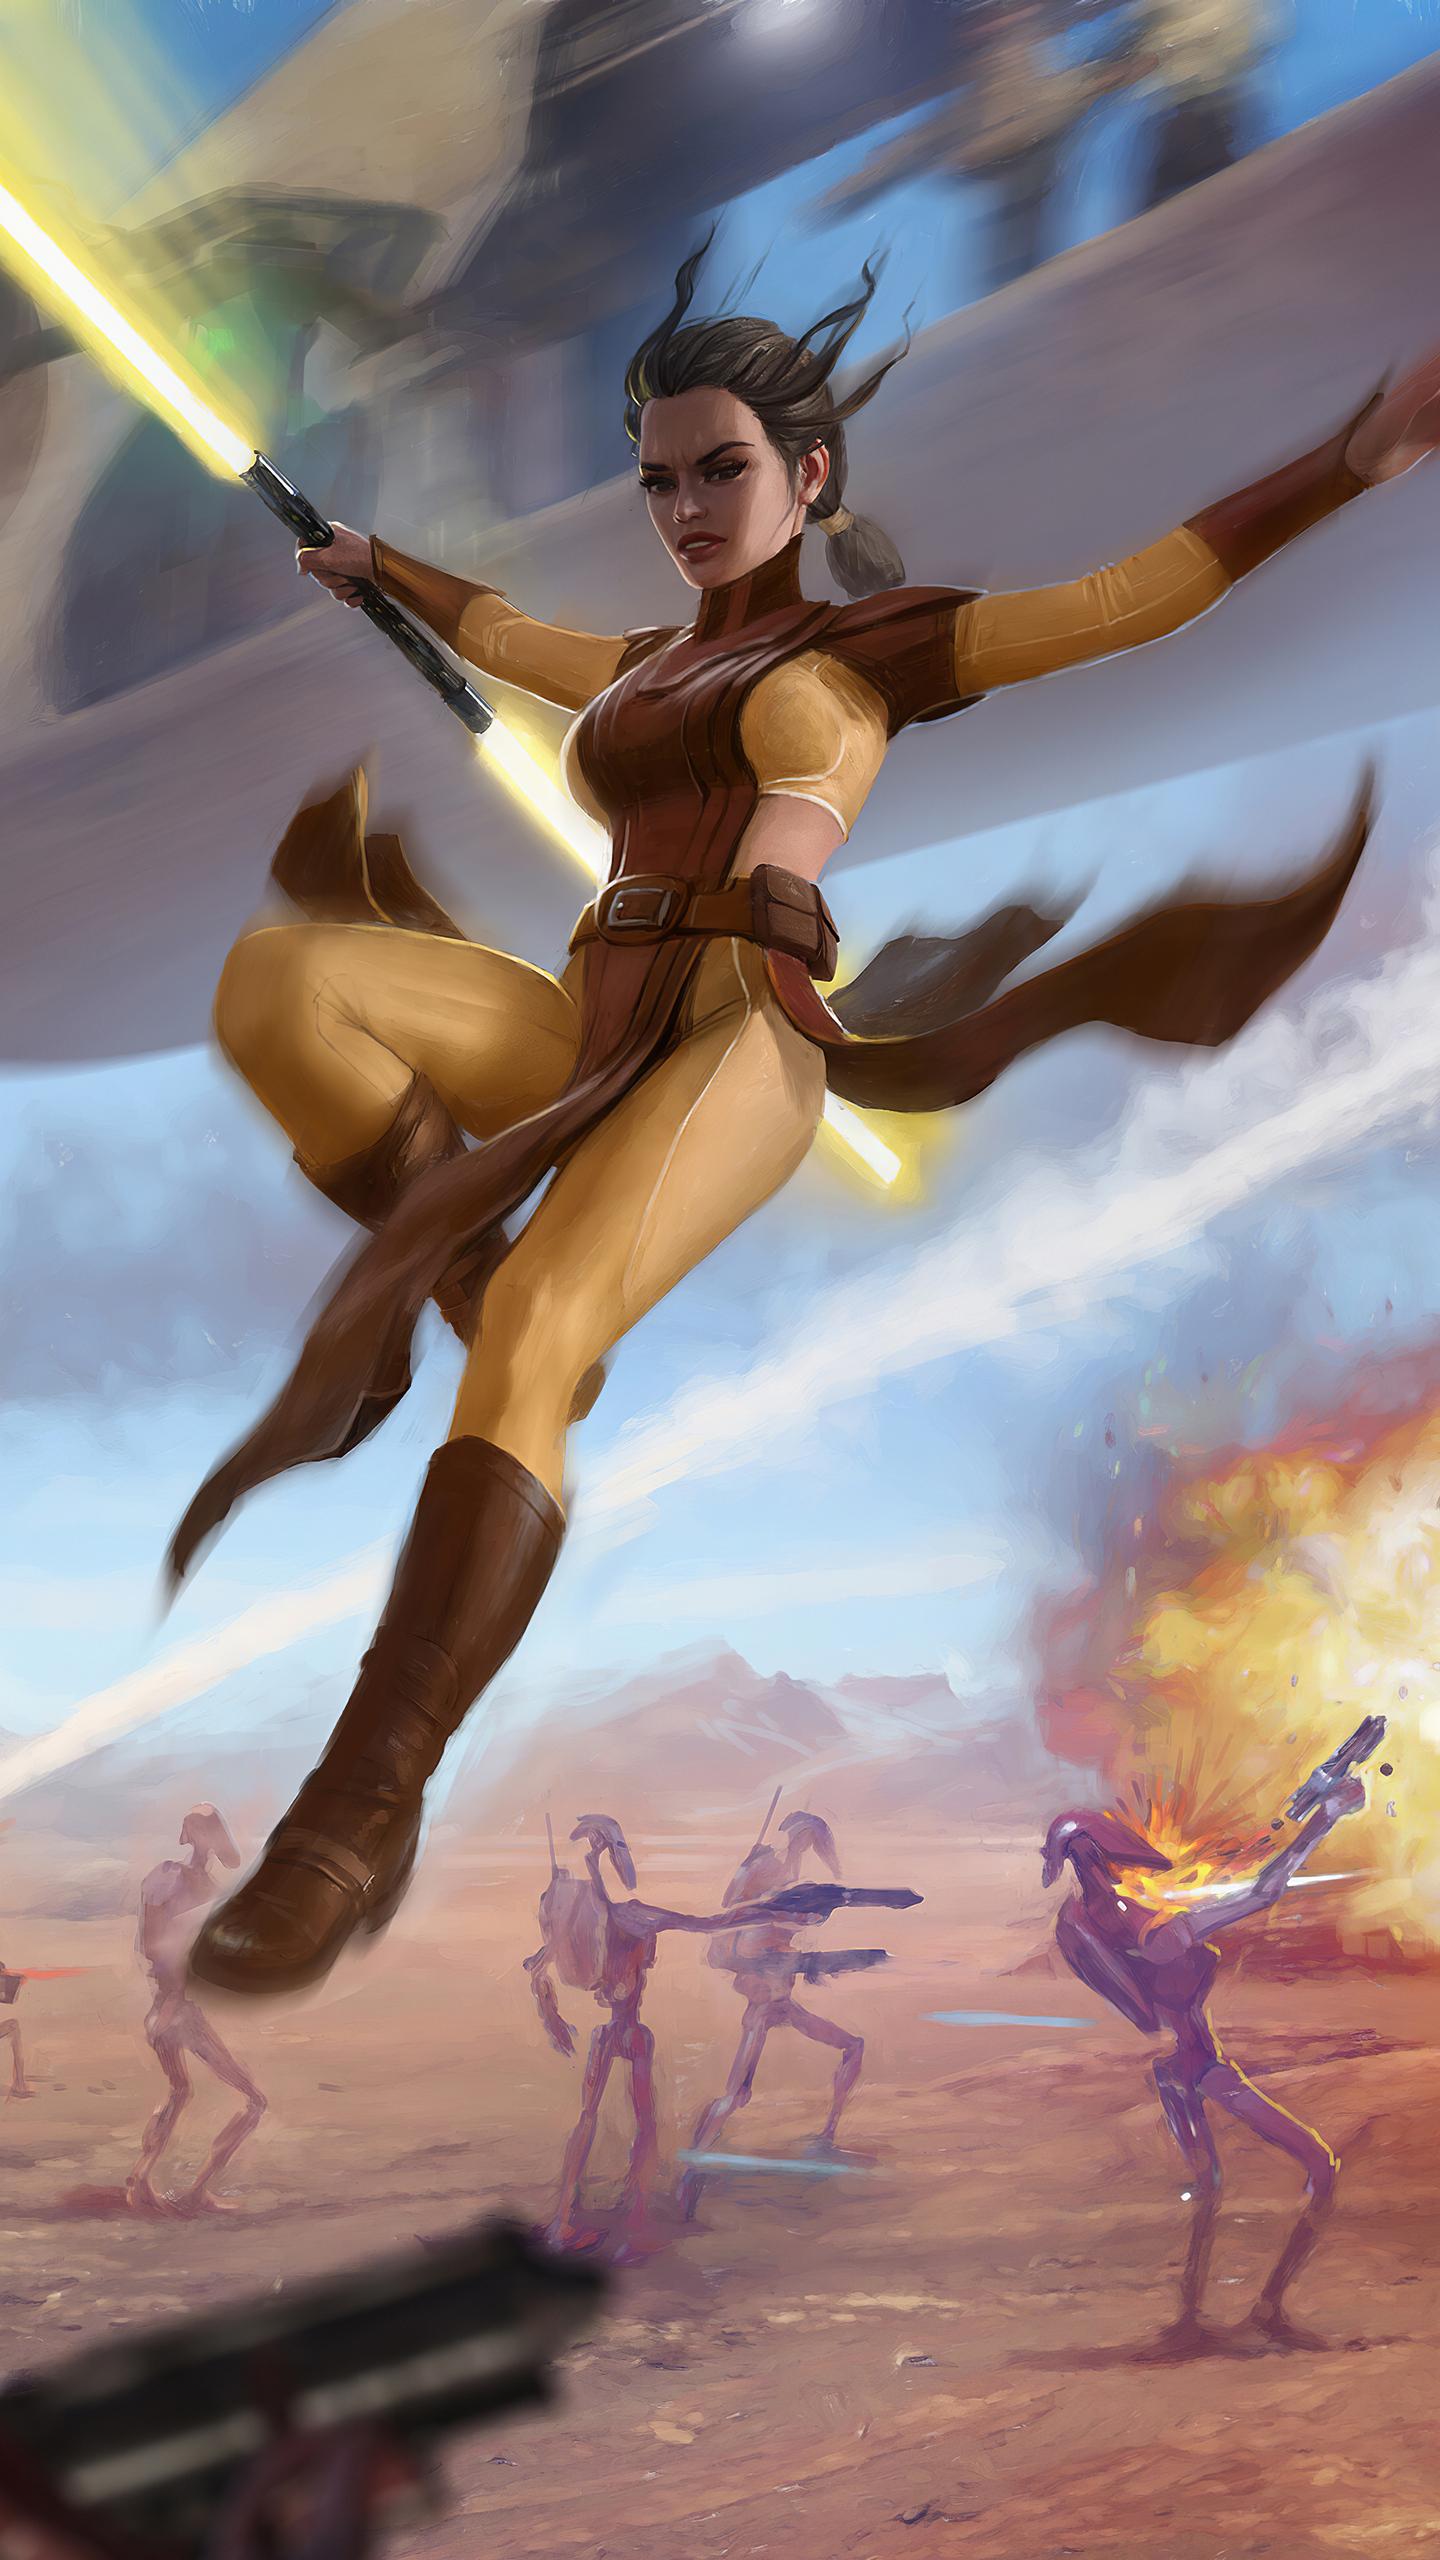 star-wars-knights-of-the-old-republic-4k-vj.jpg